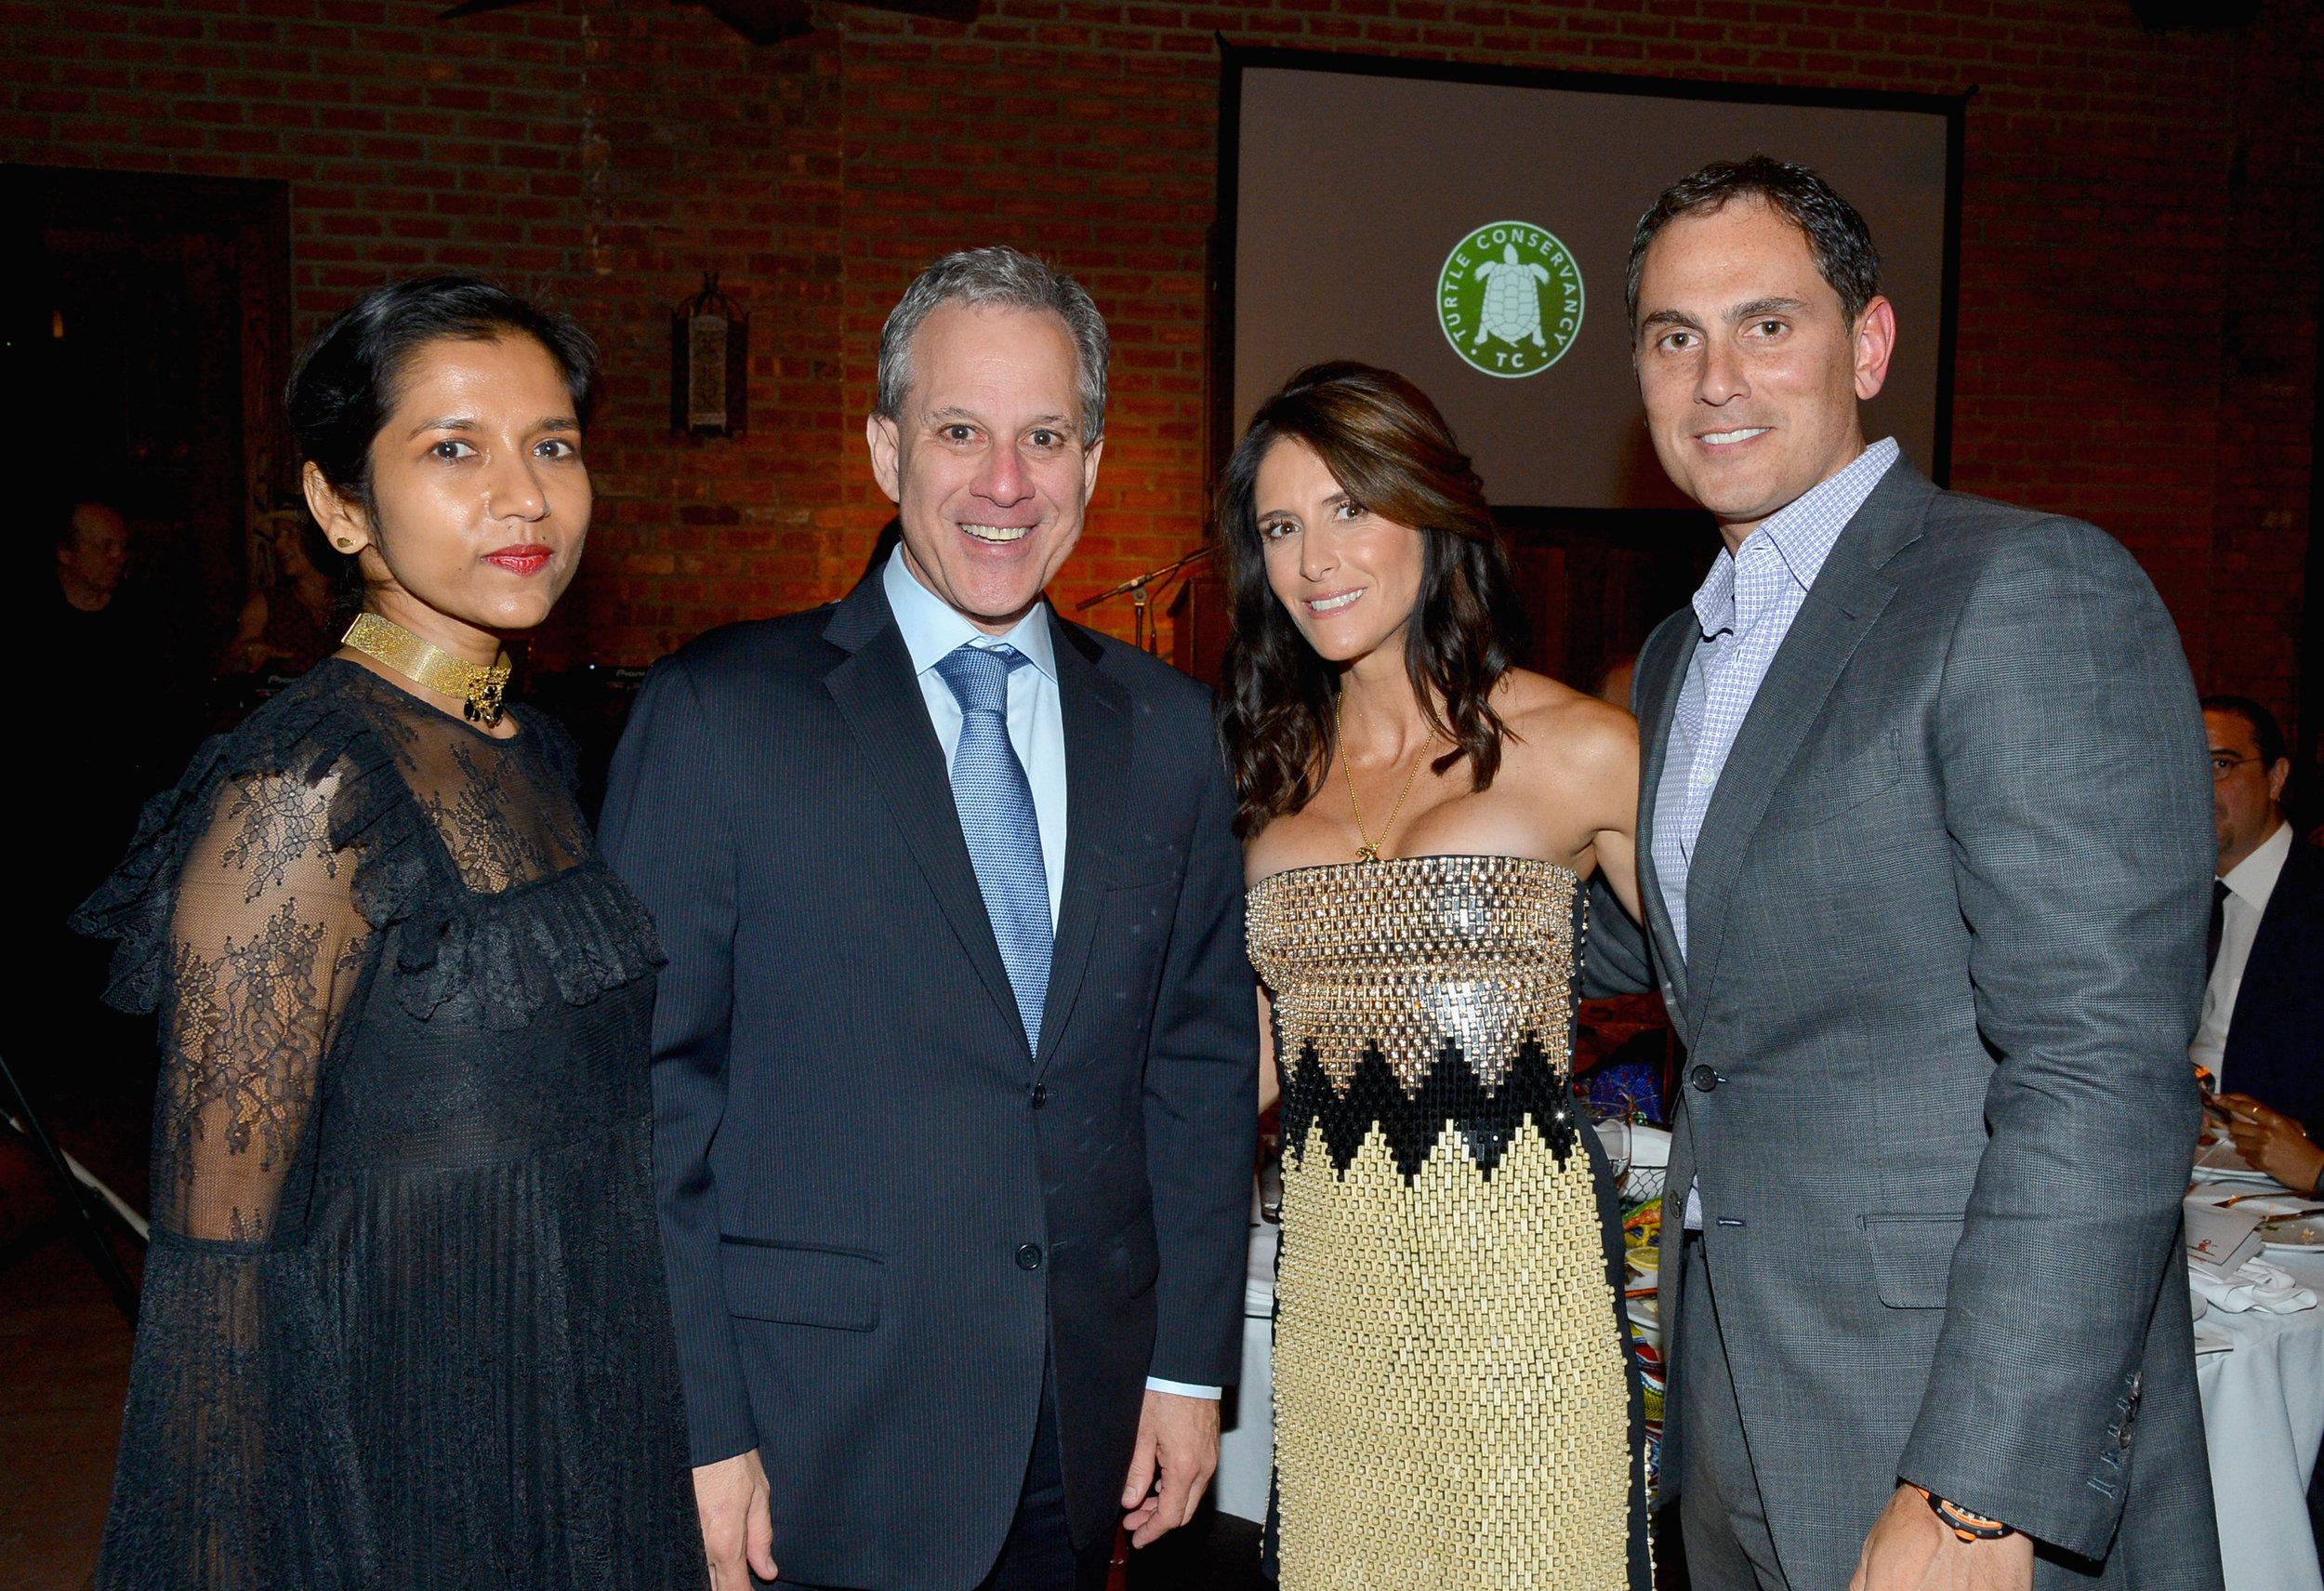 Tanya Selvaratnam, Eric Schneiderman, Adria Sheth, and Brian Sheth